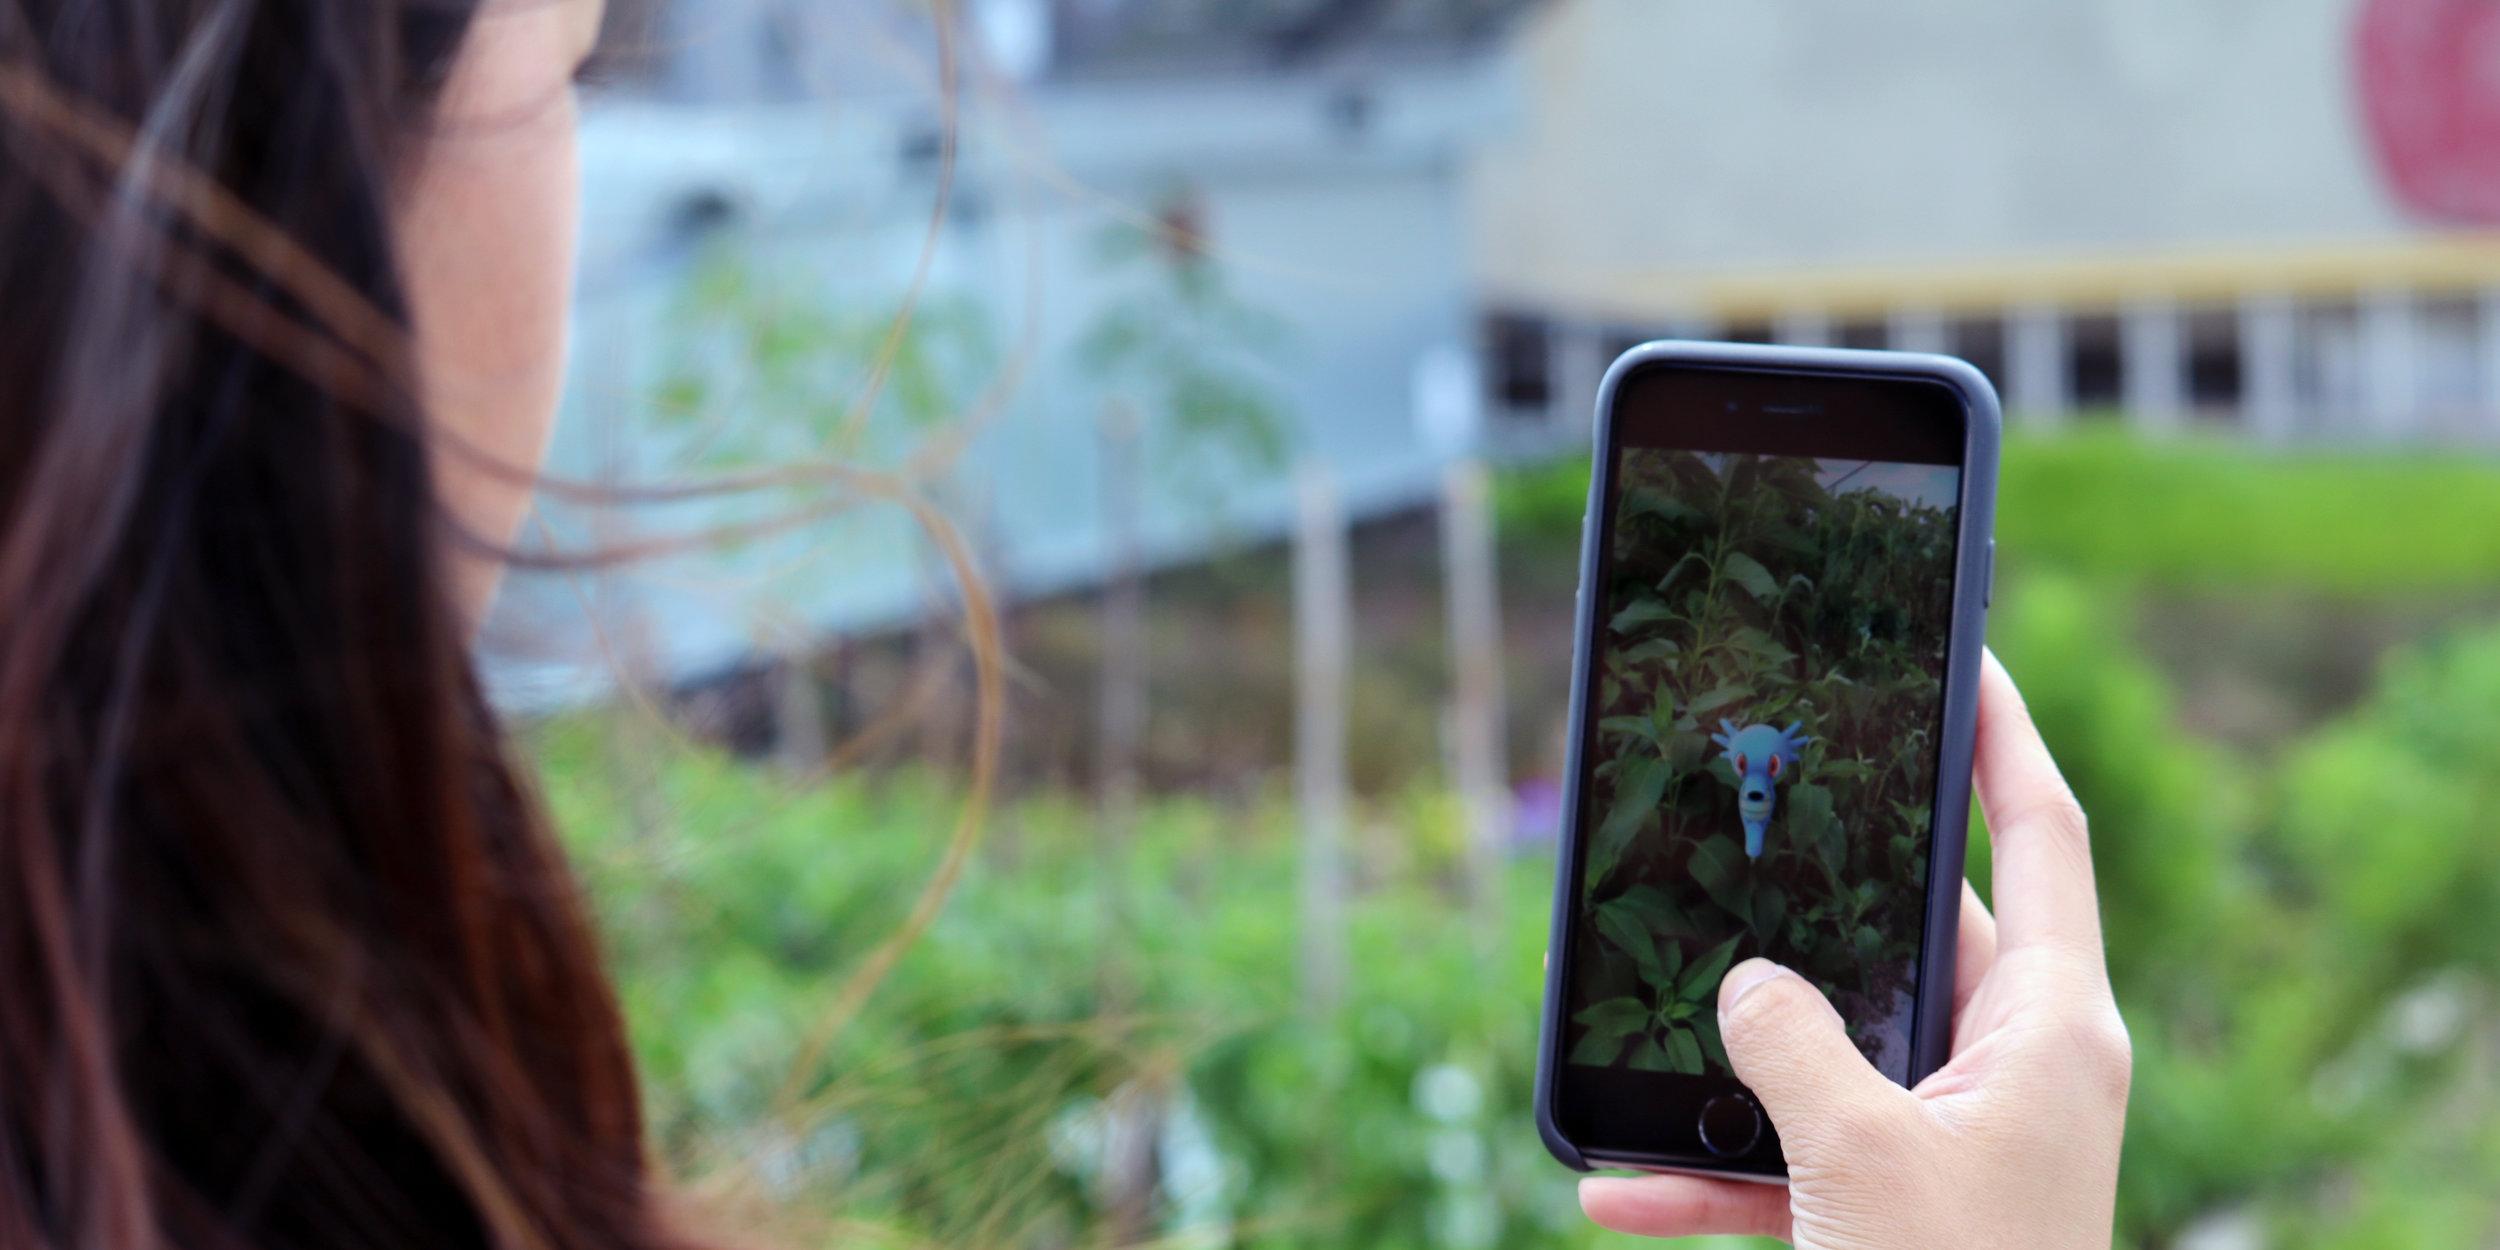 pokemon-go-app-eloquii-take-a-break-kristy